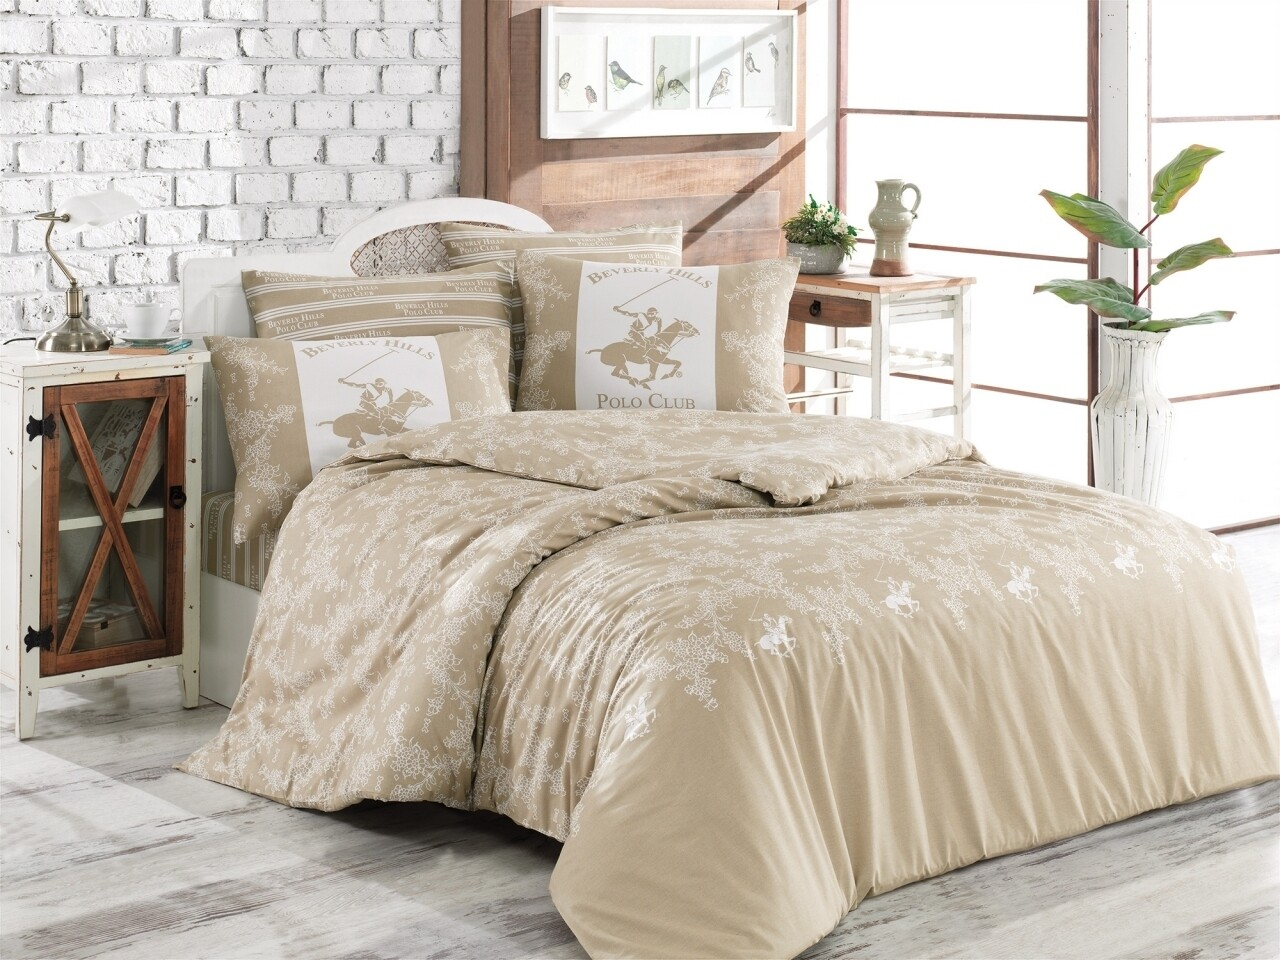 Lenjerie de pat pentru o persoana, Beverly Hills Polo Club, 3 piese, 160 x 240 cm, 100% bumbac ranforce, crem/alb